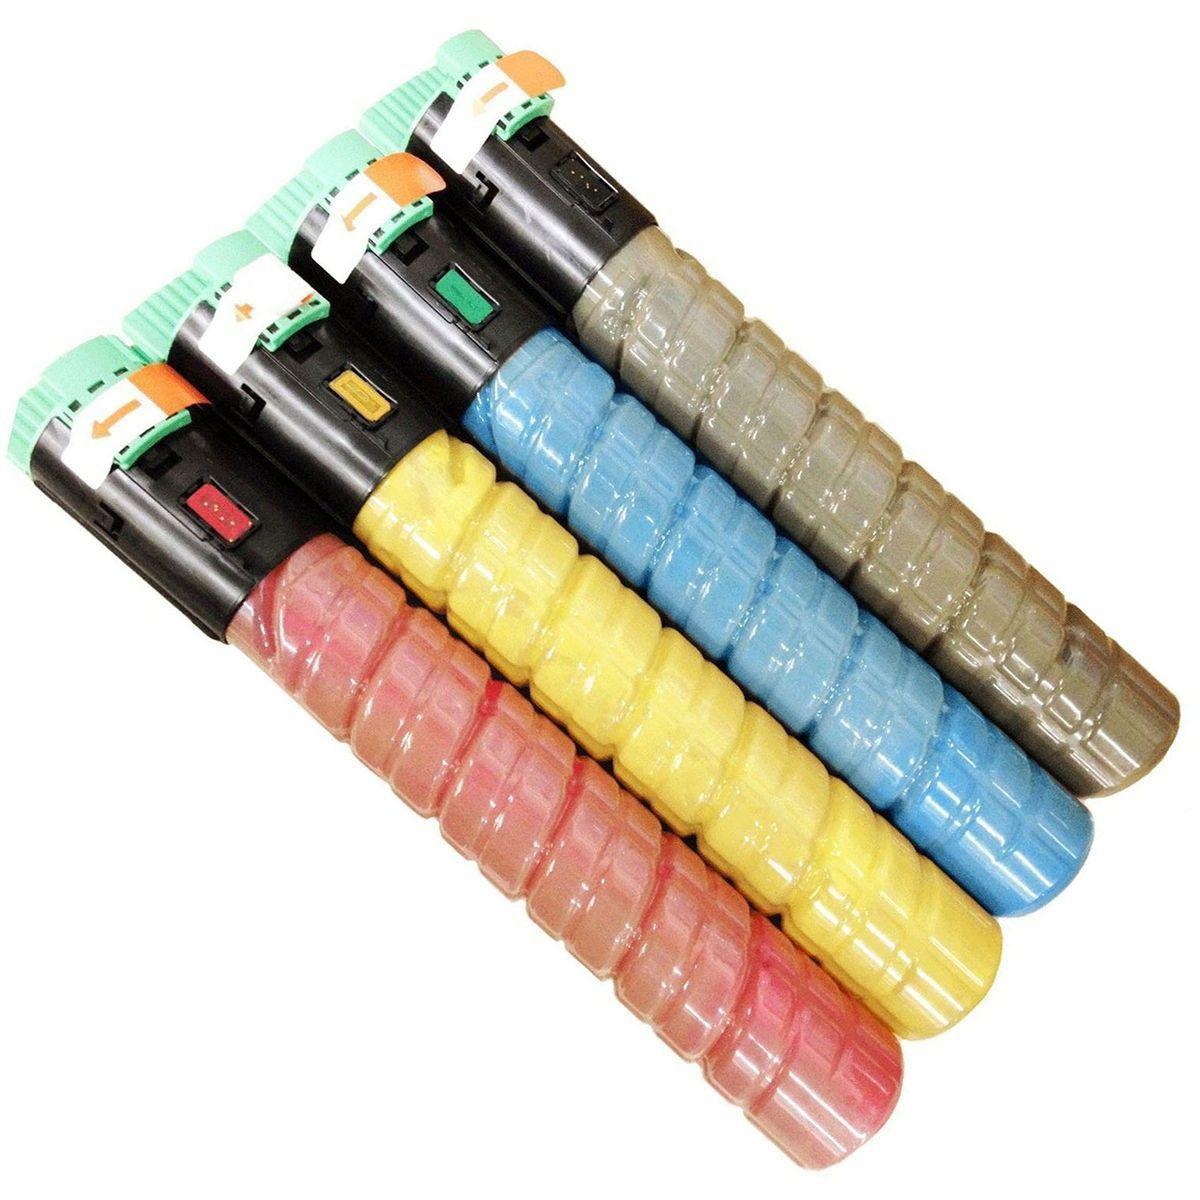 Compatível: Kit Colorido de Toner C2050 para Ricoh MPC2051 MPC2050 C2551 C2030 C2530 C2050 C2550 C2050sfp C2550spf